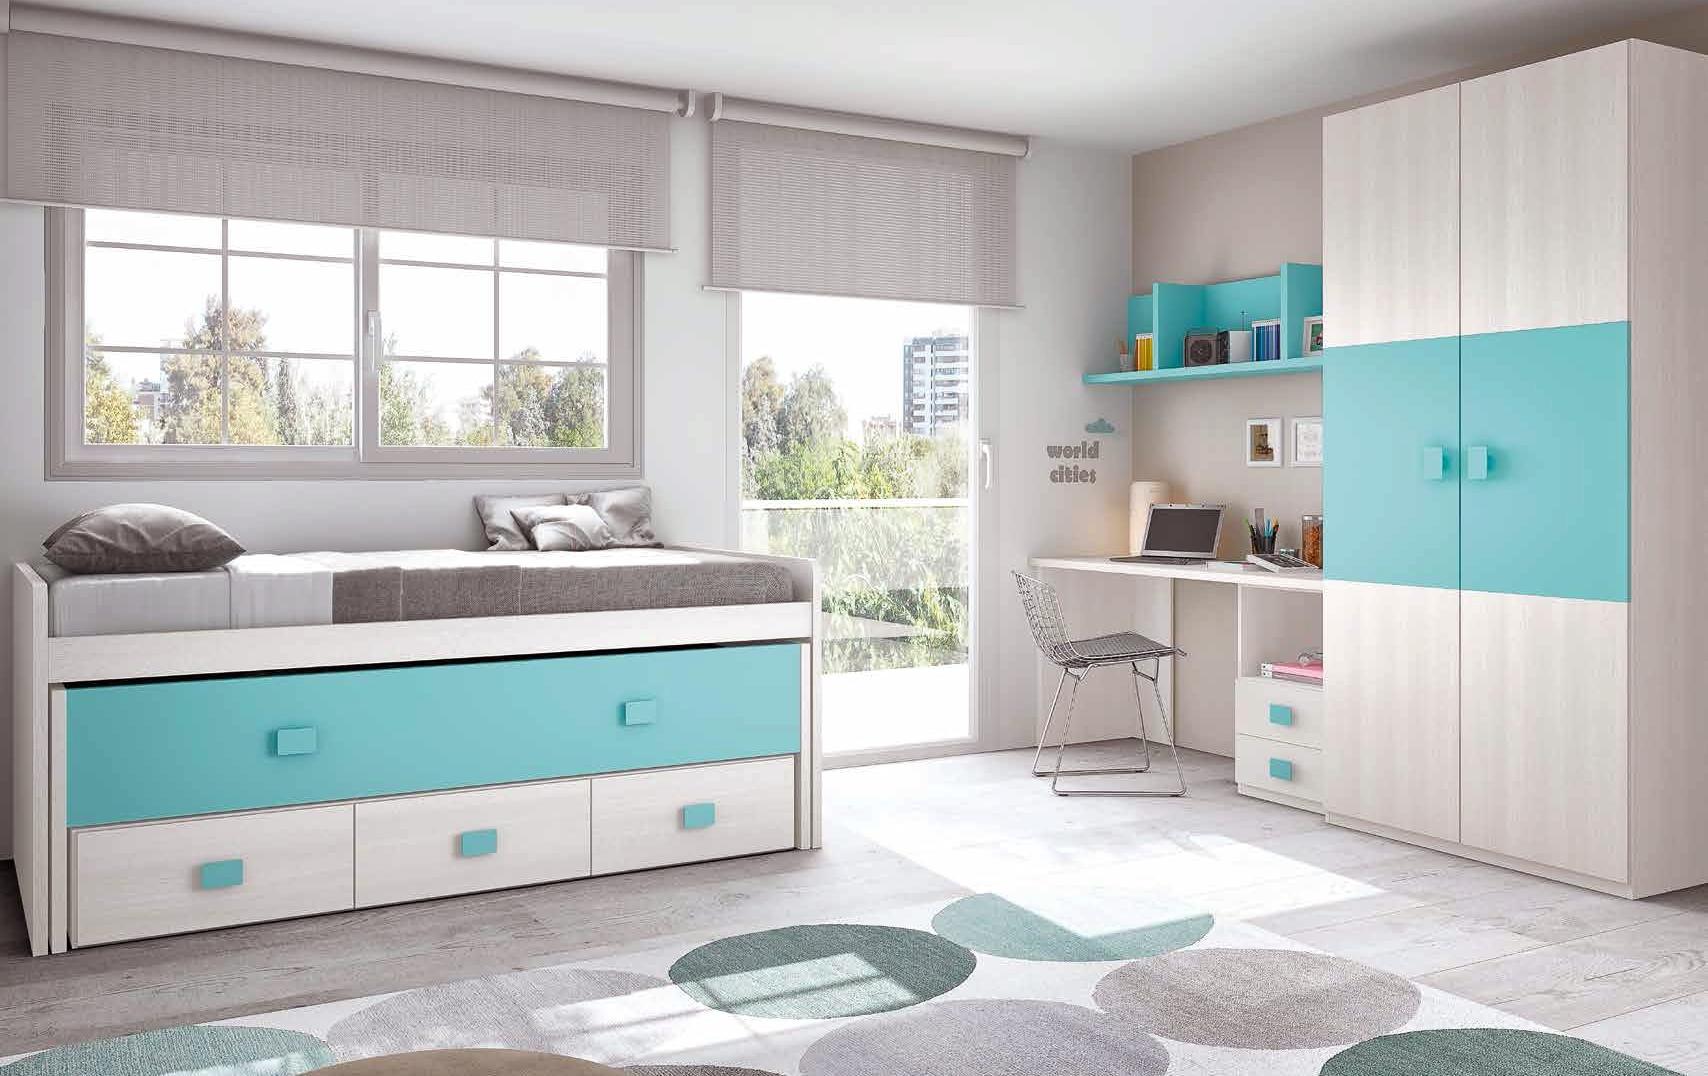 chambre enfant complete moderne  color  GLICERIO  SO NUIT